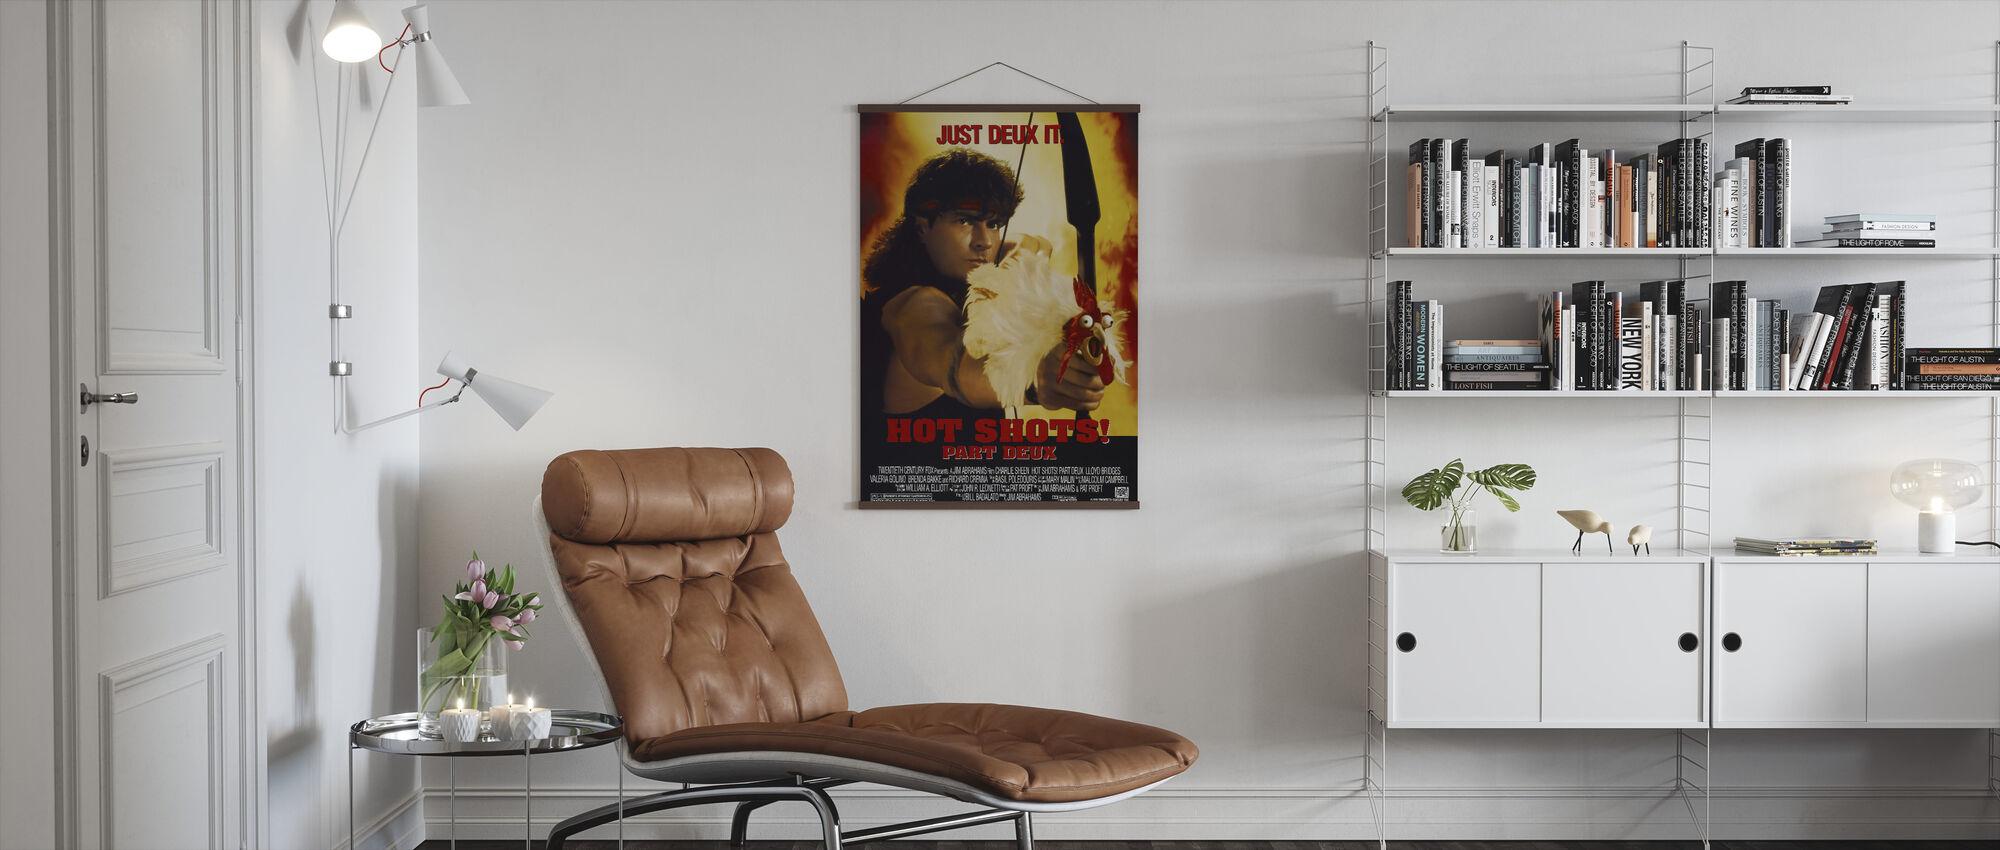 Charlie Sheen in Hot Shots Part Deux - Poster - Living Room